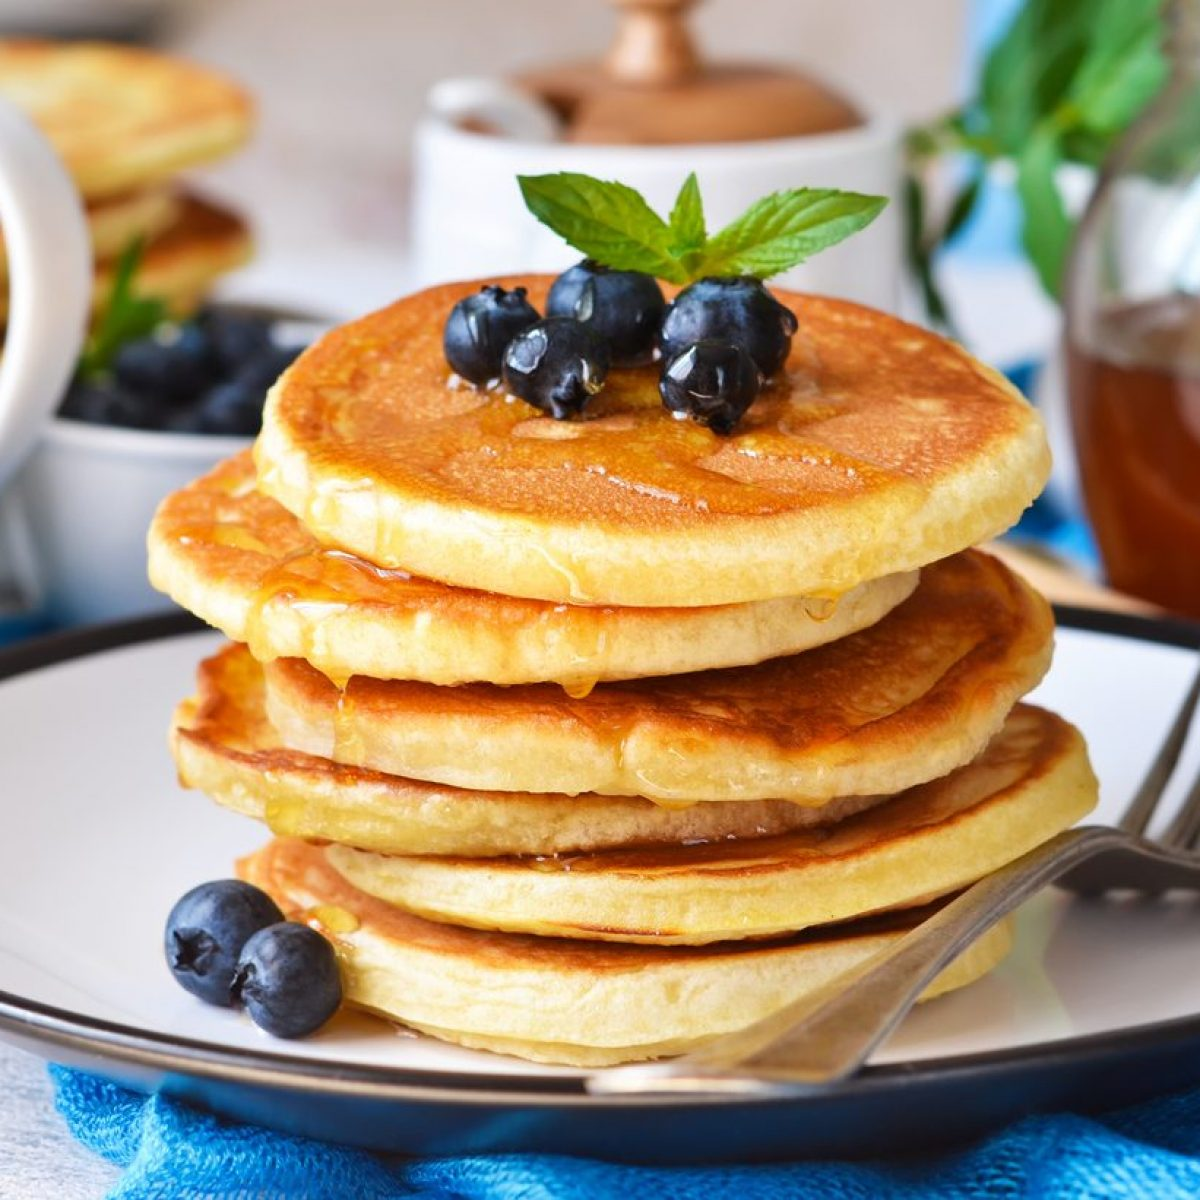 Ricetta Pancake Originali Americani.Pancakes Senza Burro La Ricetta Per Prepararli Soffici E Leggeri In Pochi Minuti